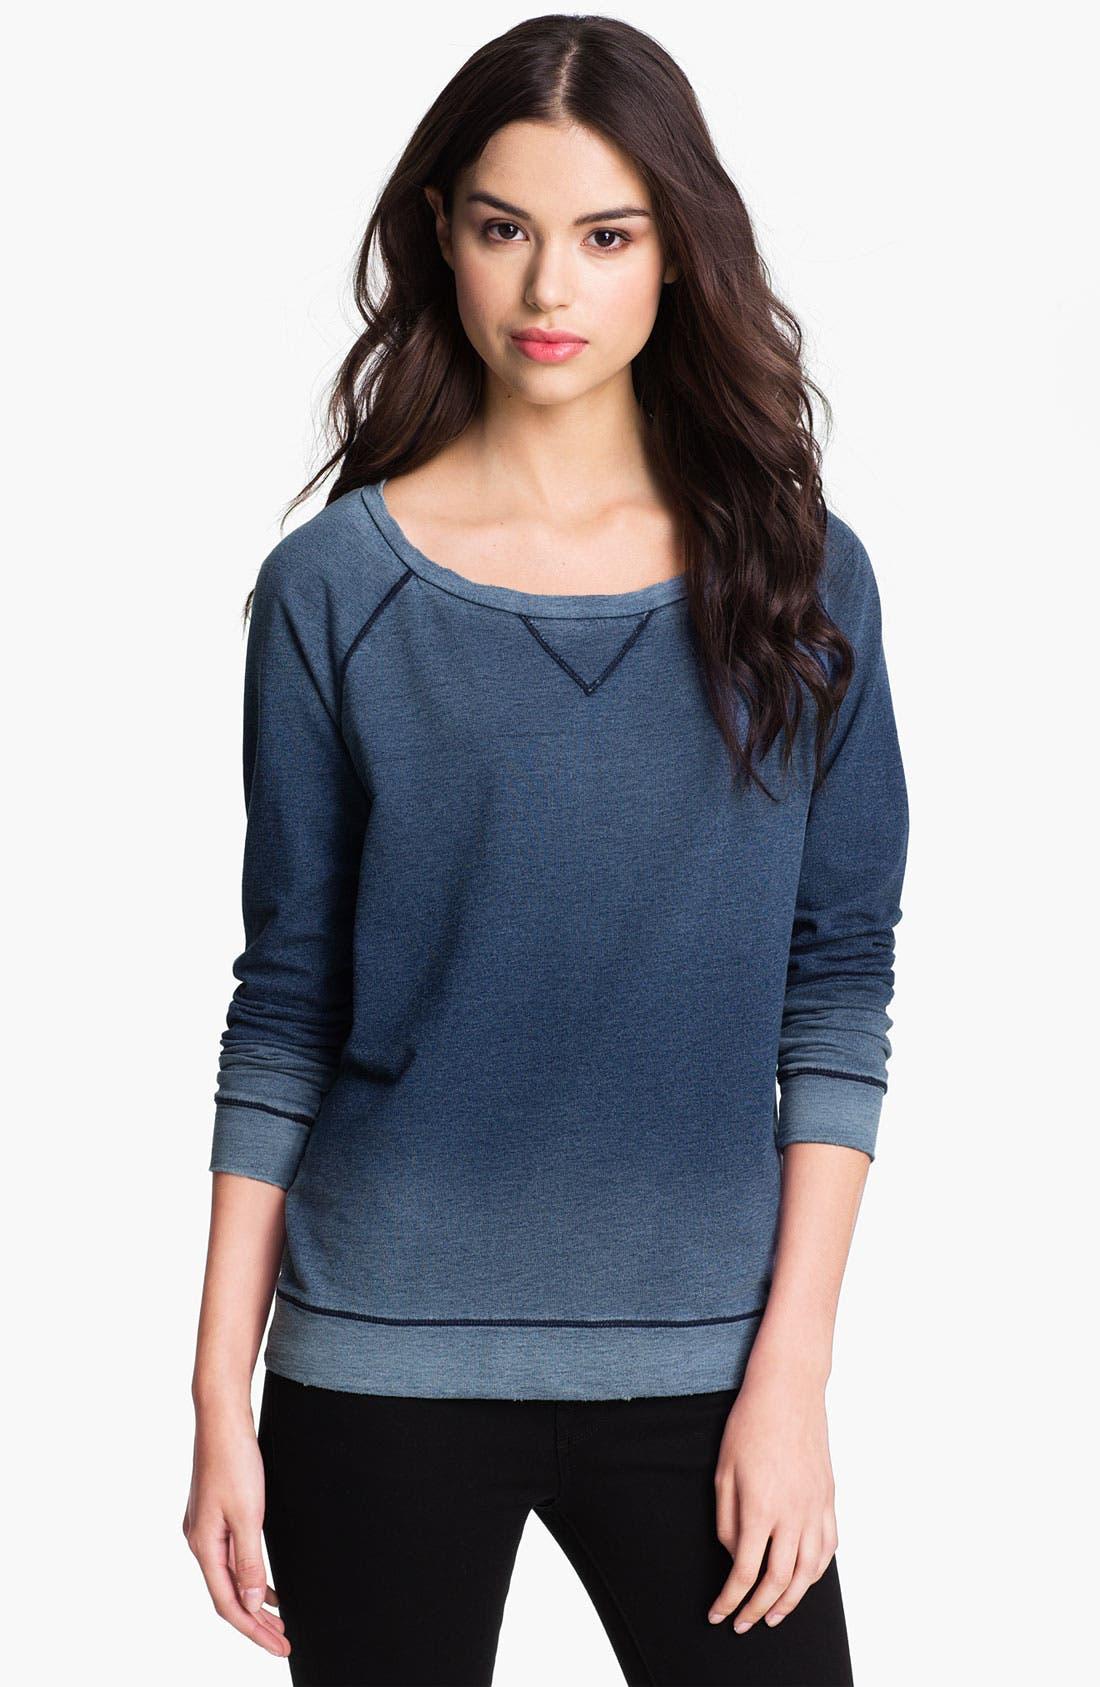 Main Image - Soft Joie 'Amity' Ombré Sweatshirt